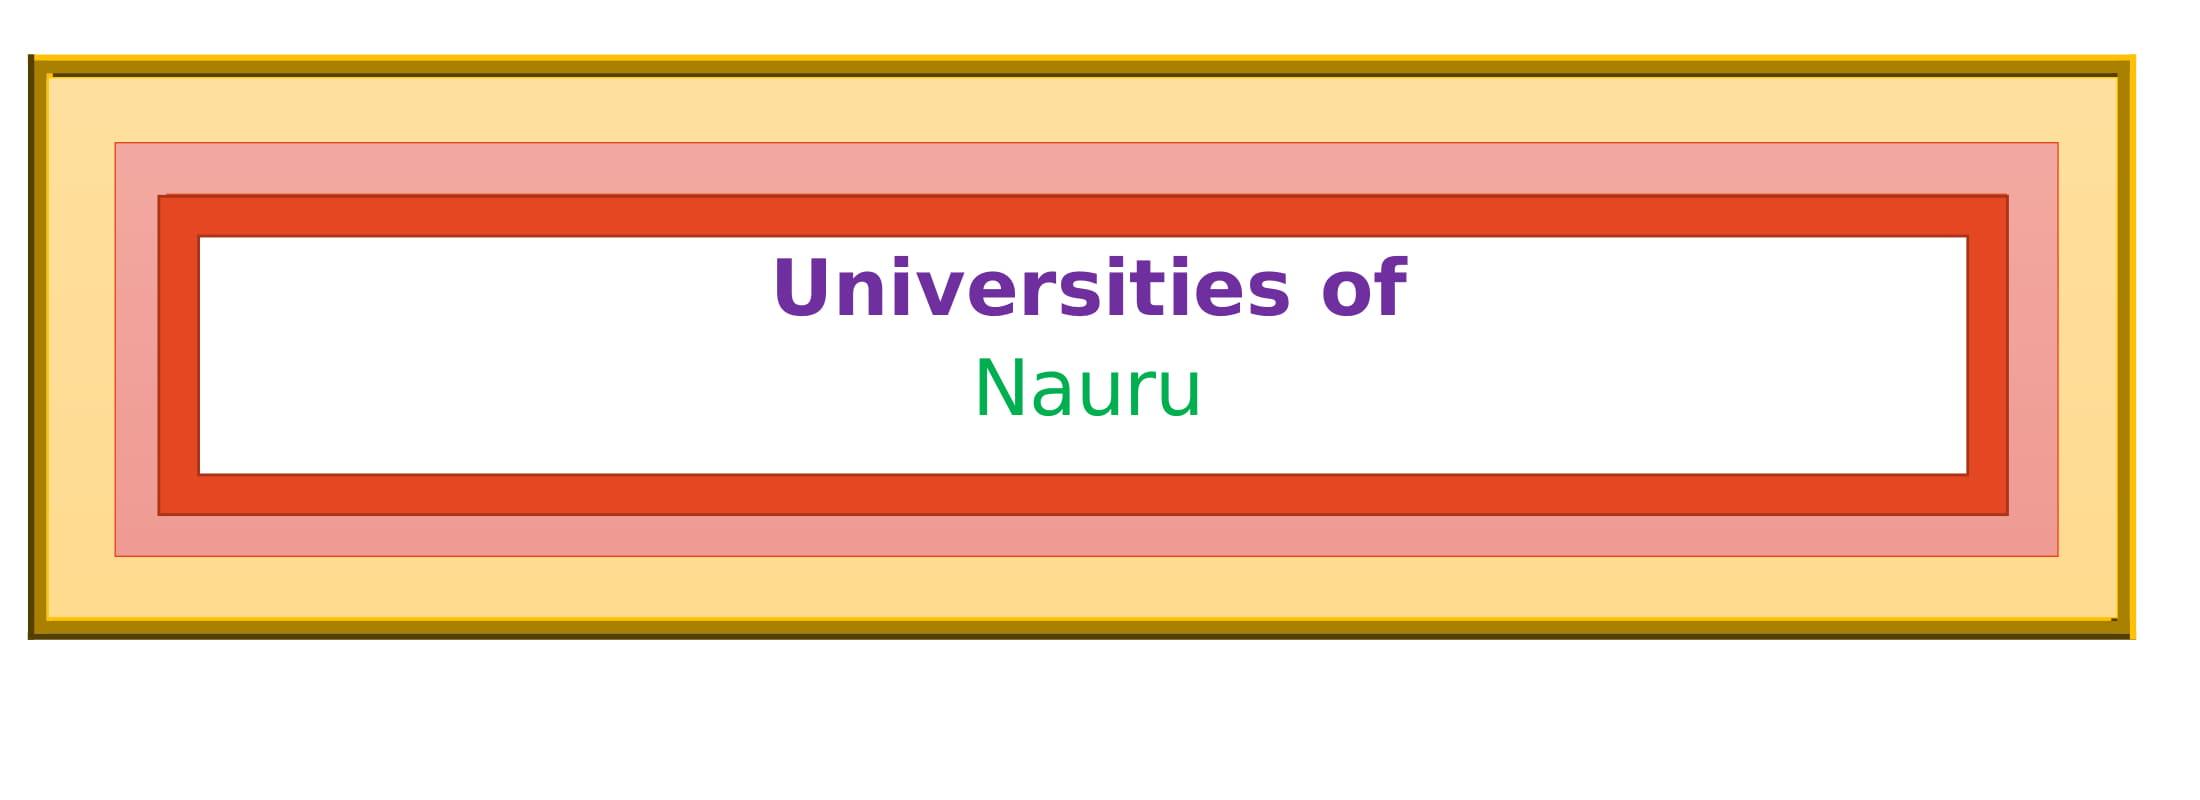 List of Universities in Nauru